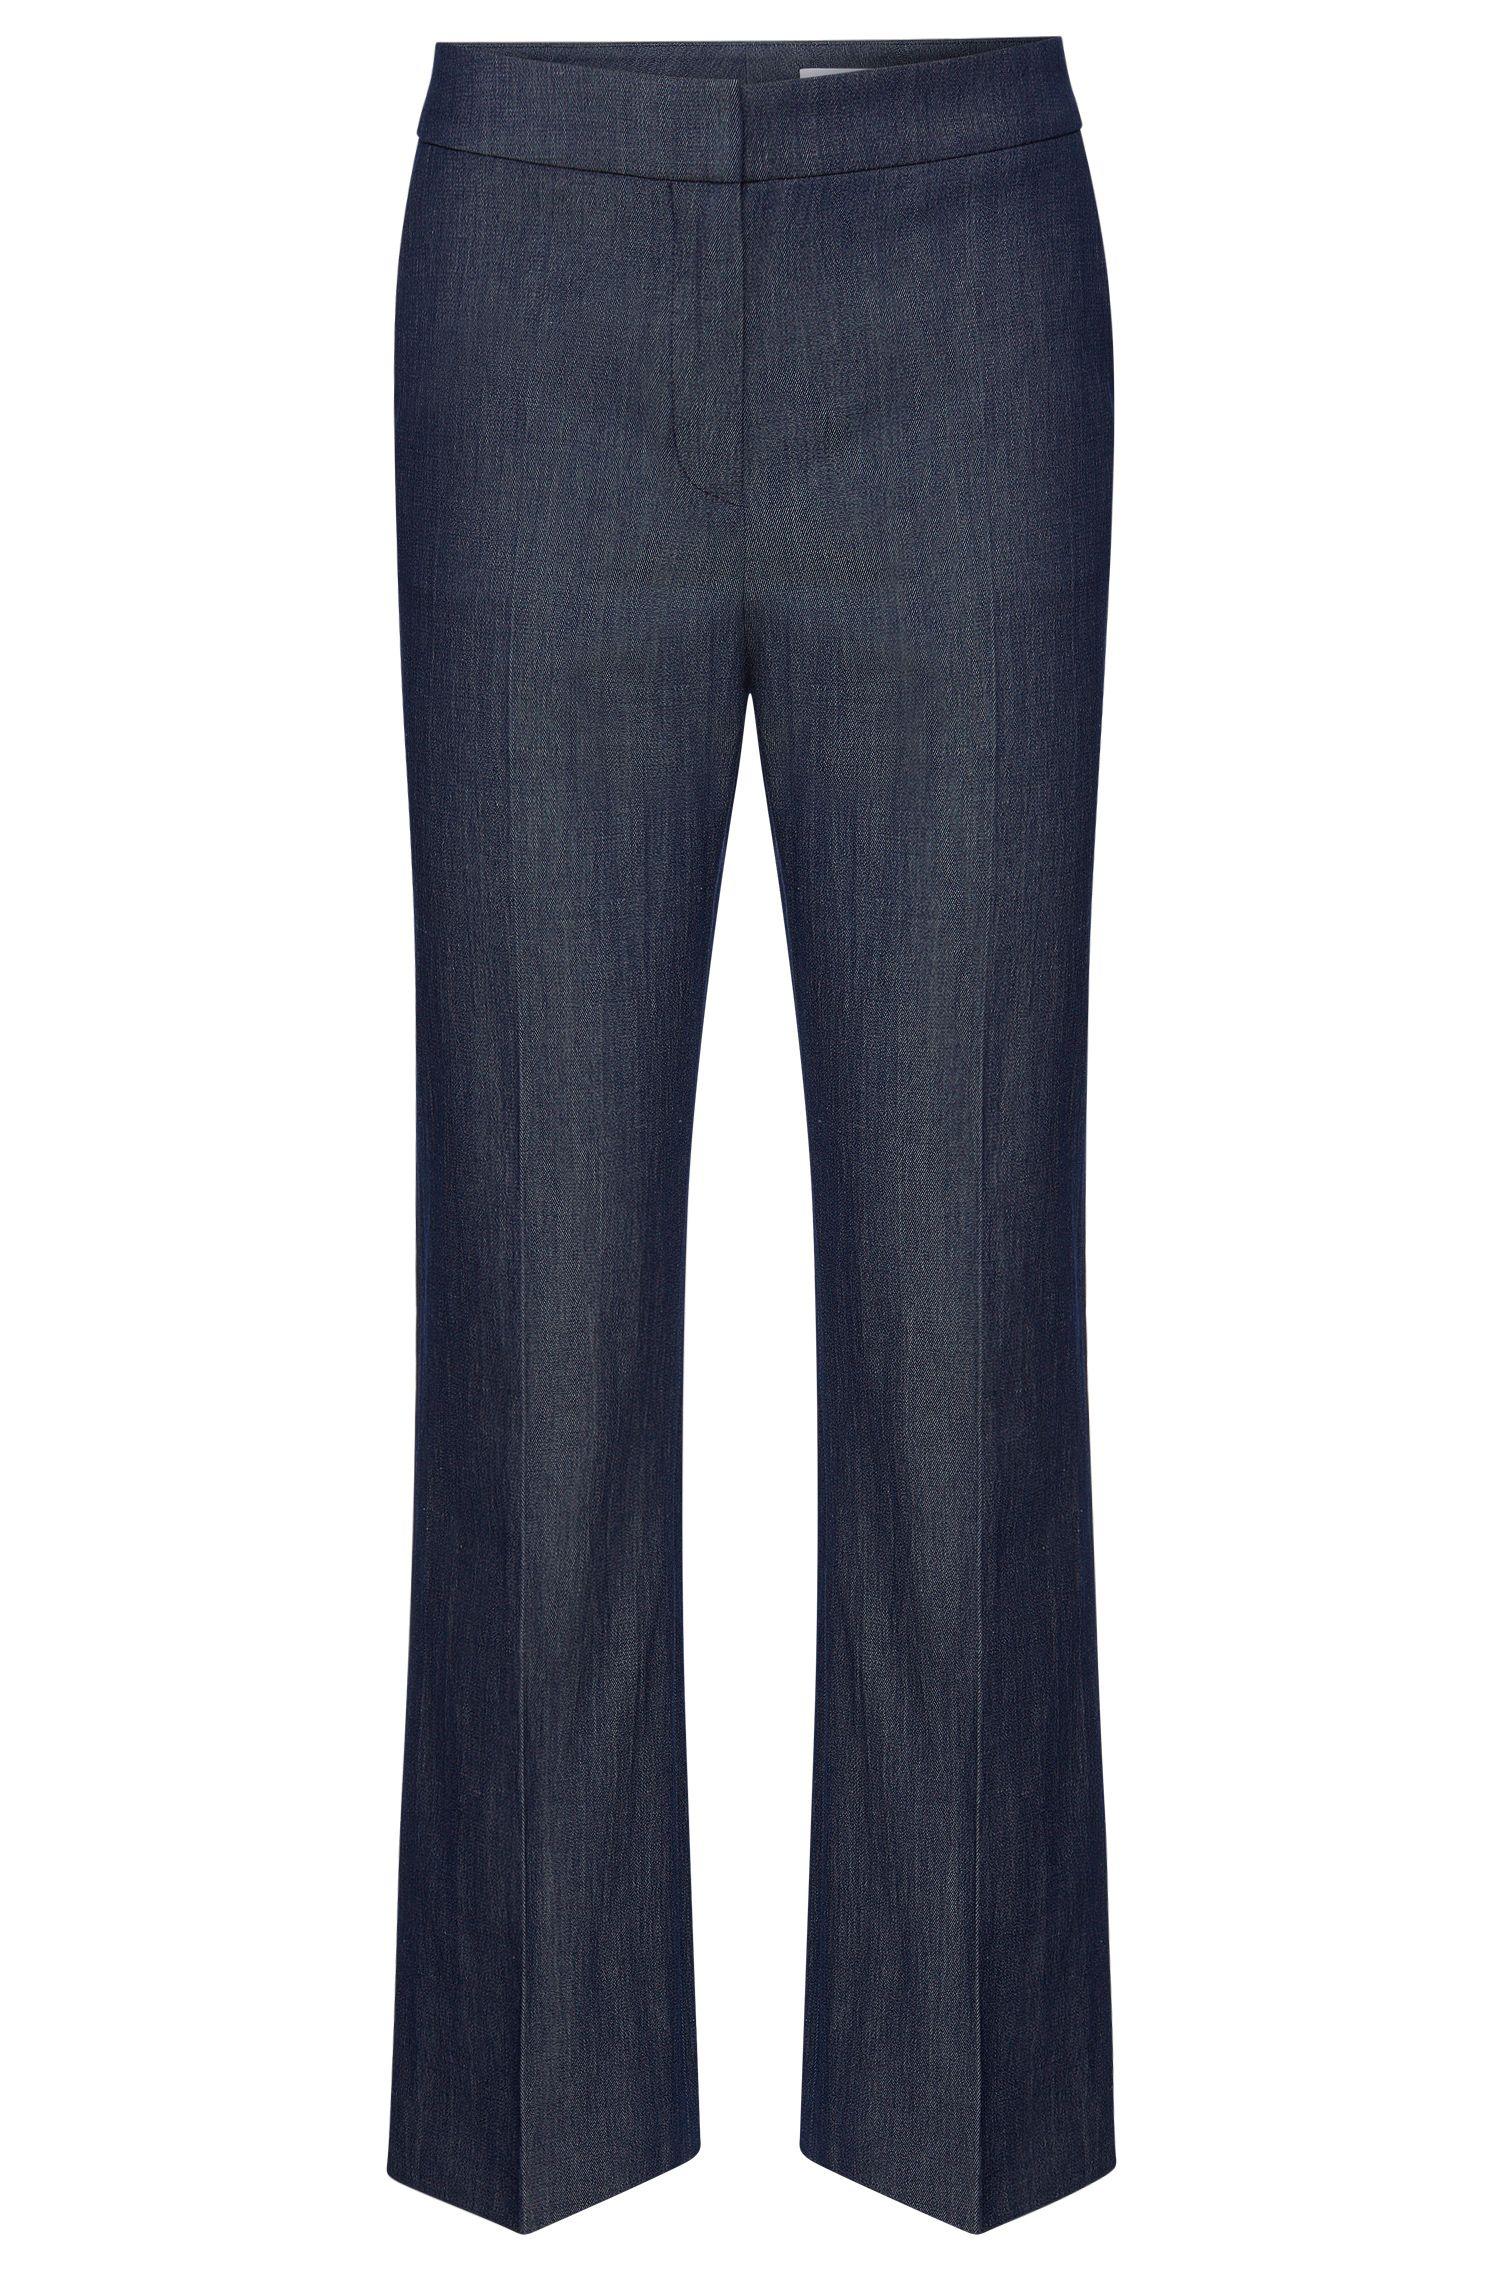 'Allery' | Stretch Virgin Wool Linen Cotton Trousers